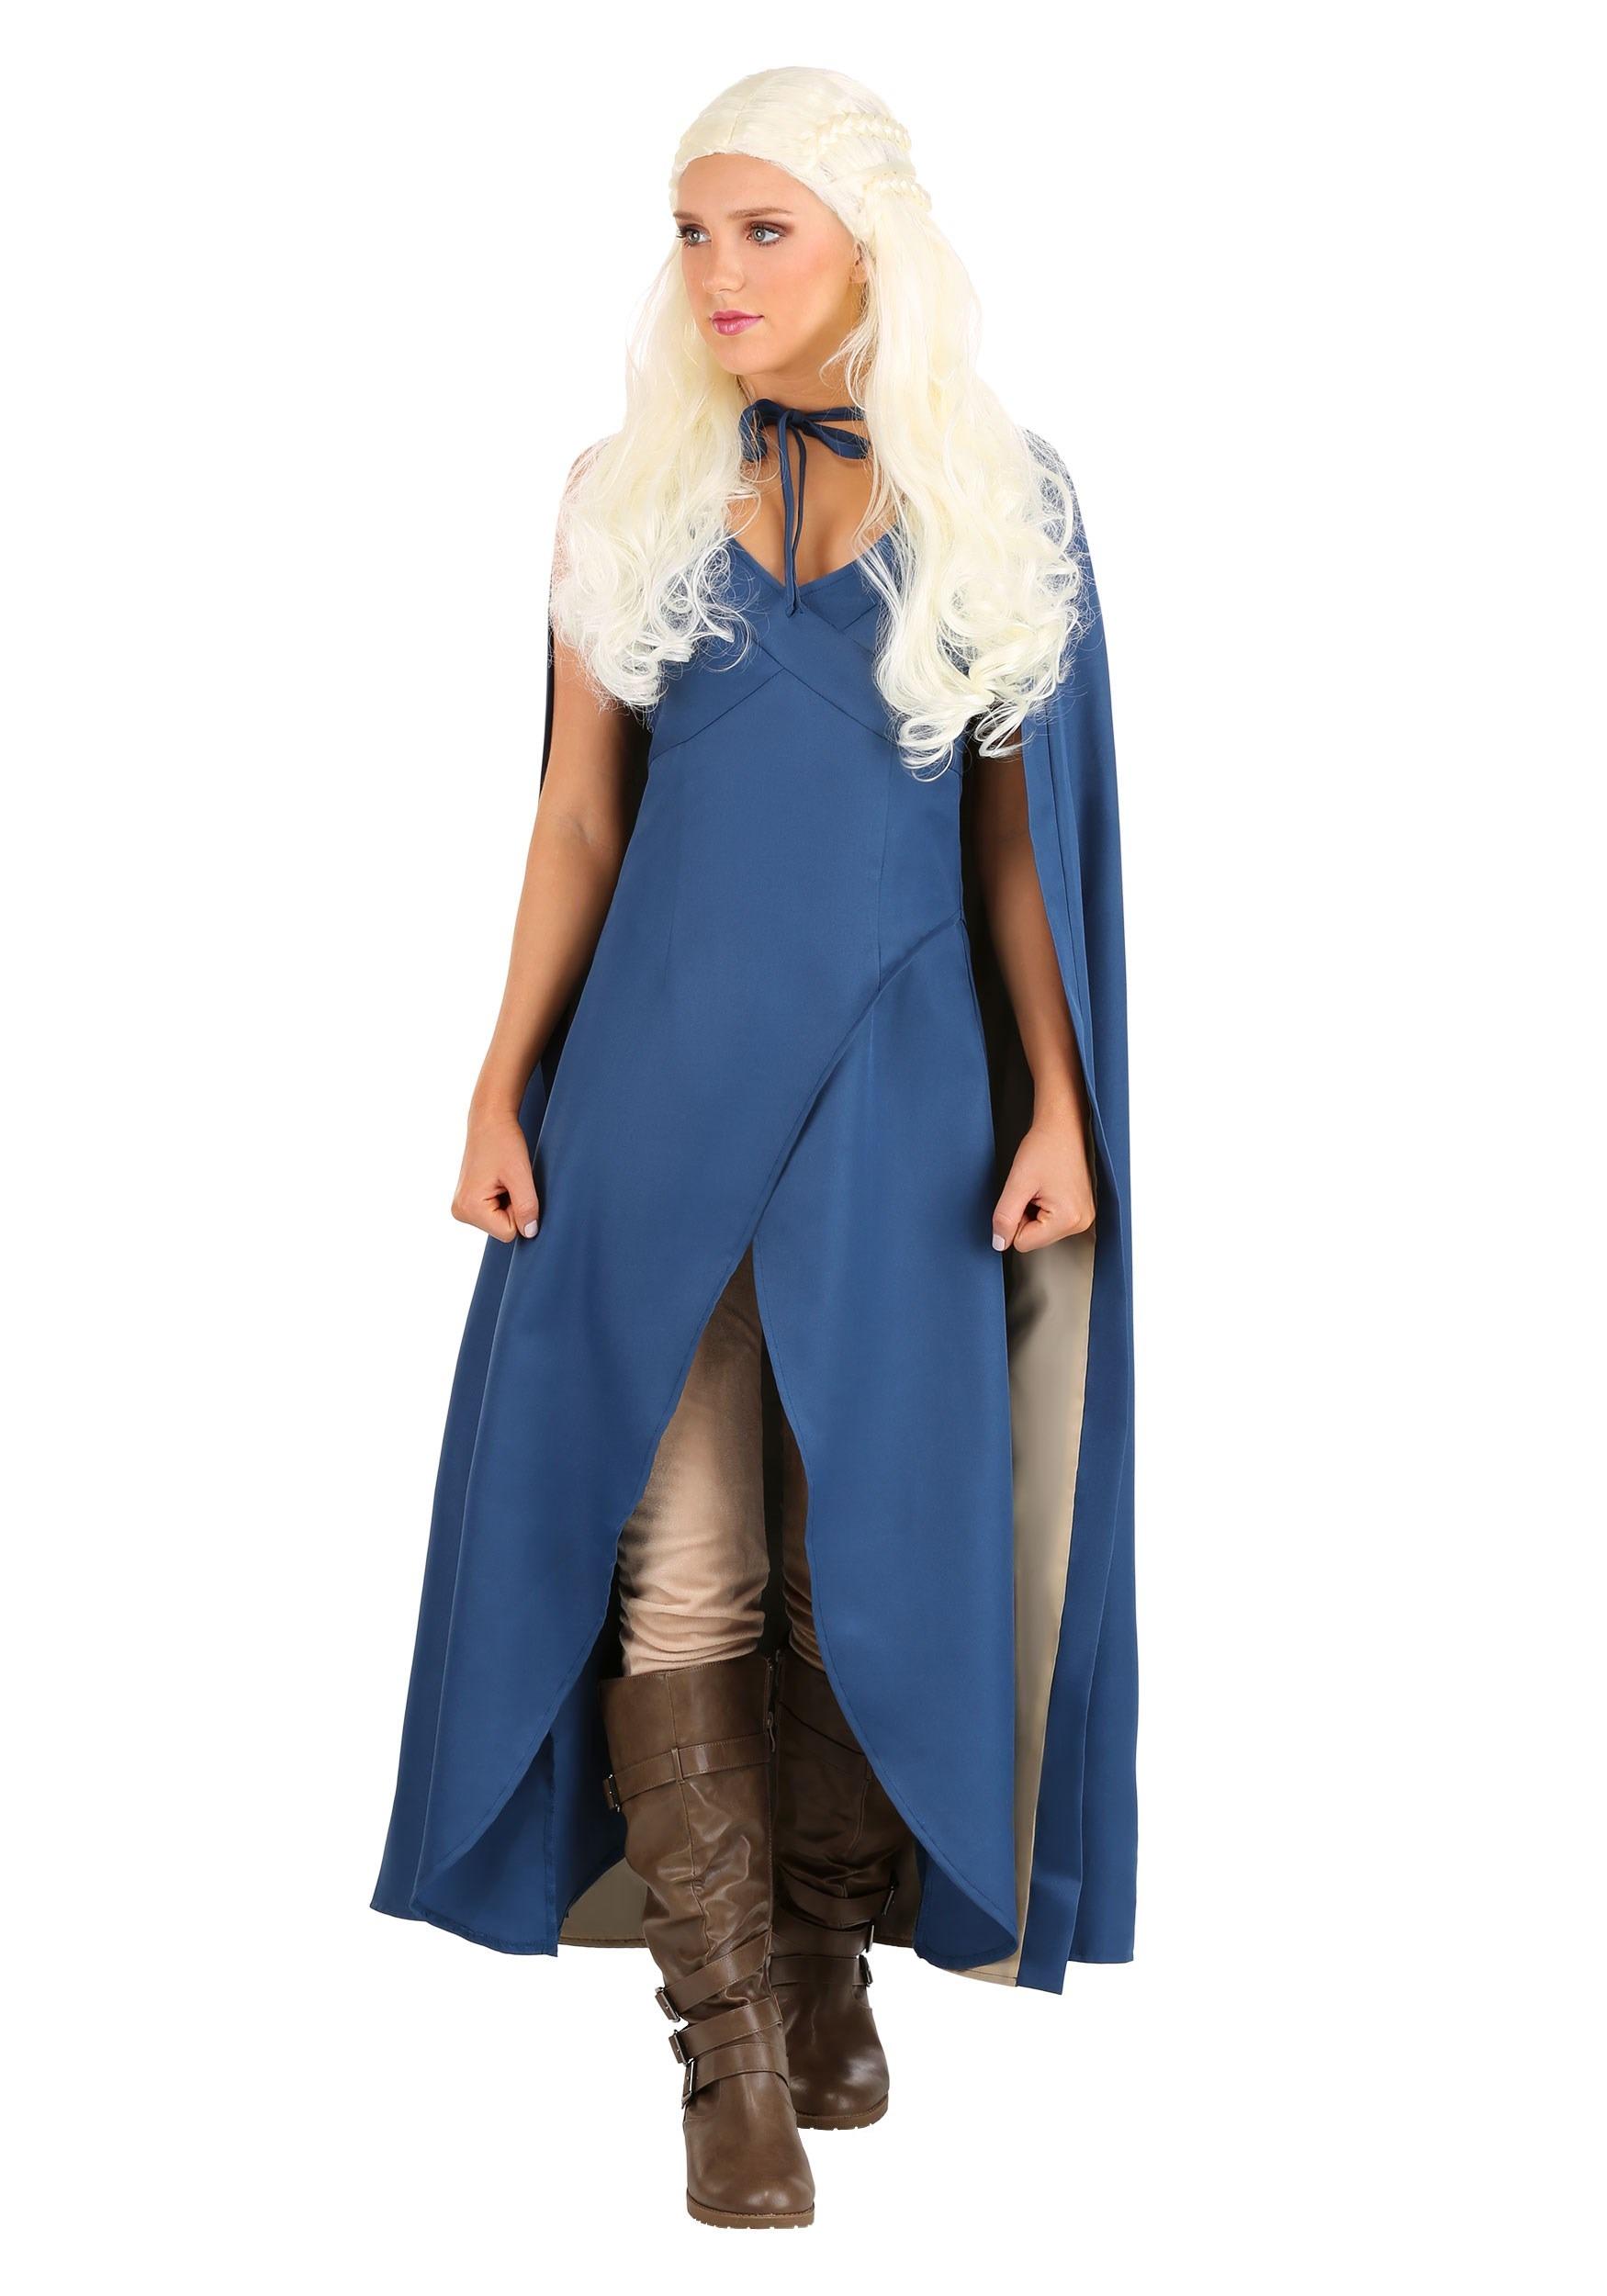 Fiery Queen Costume for Women